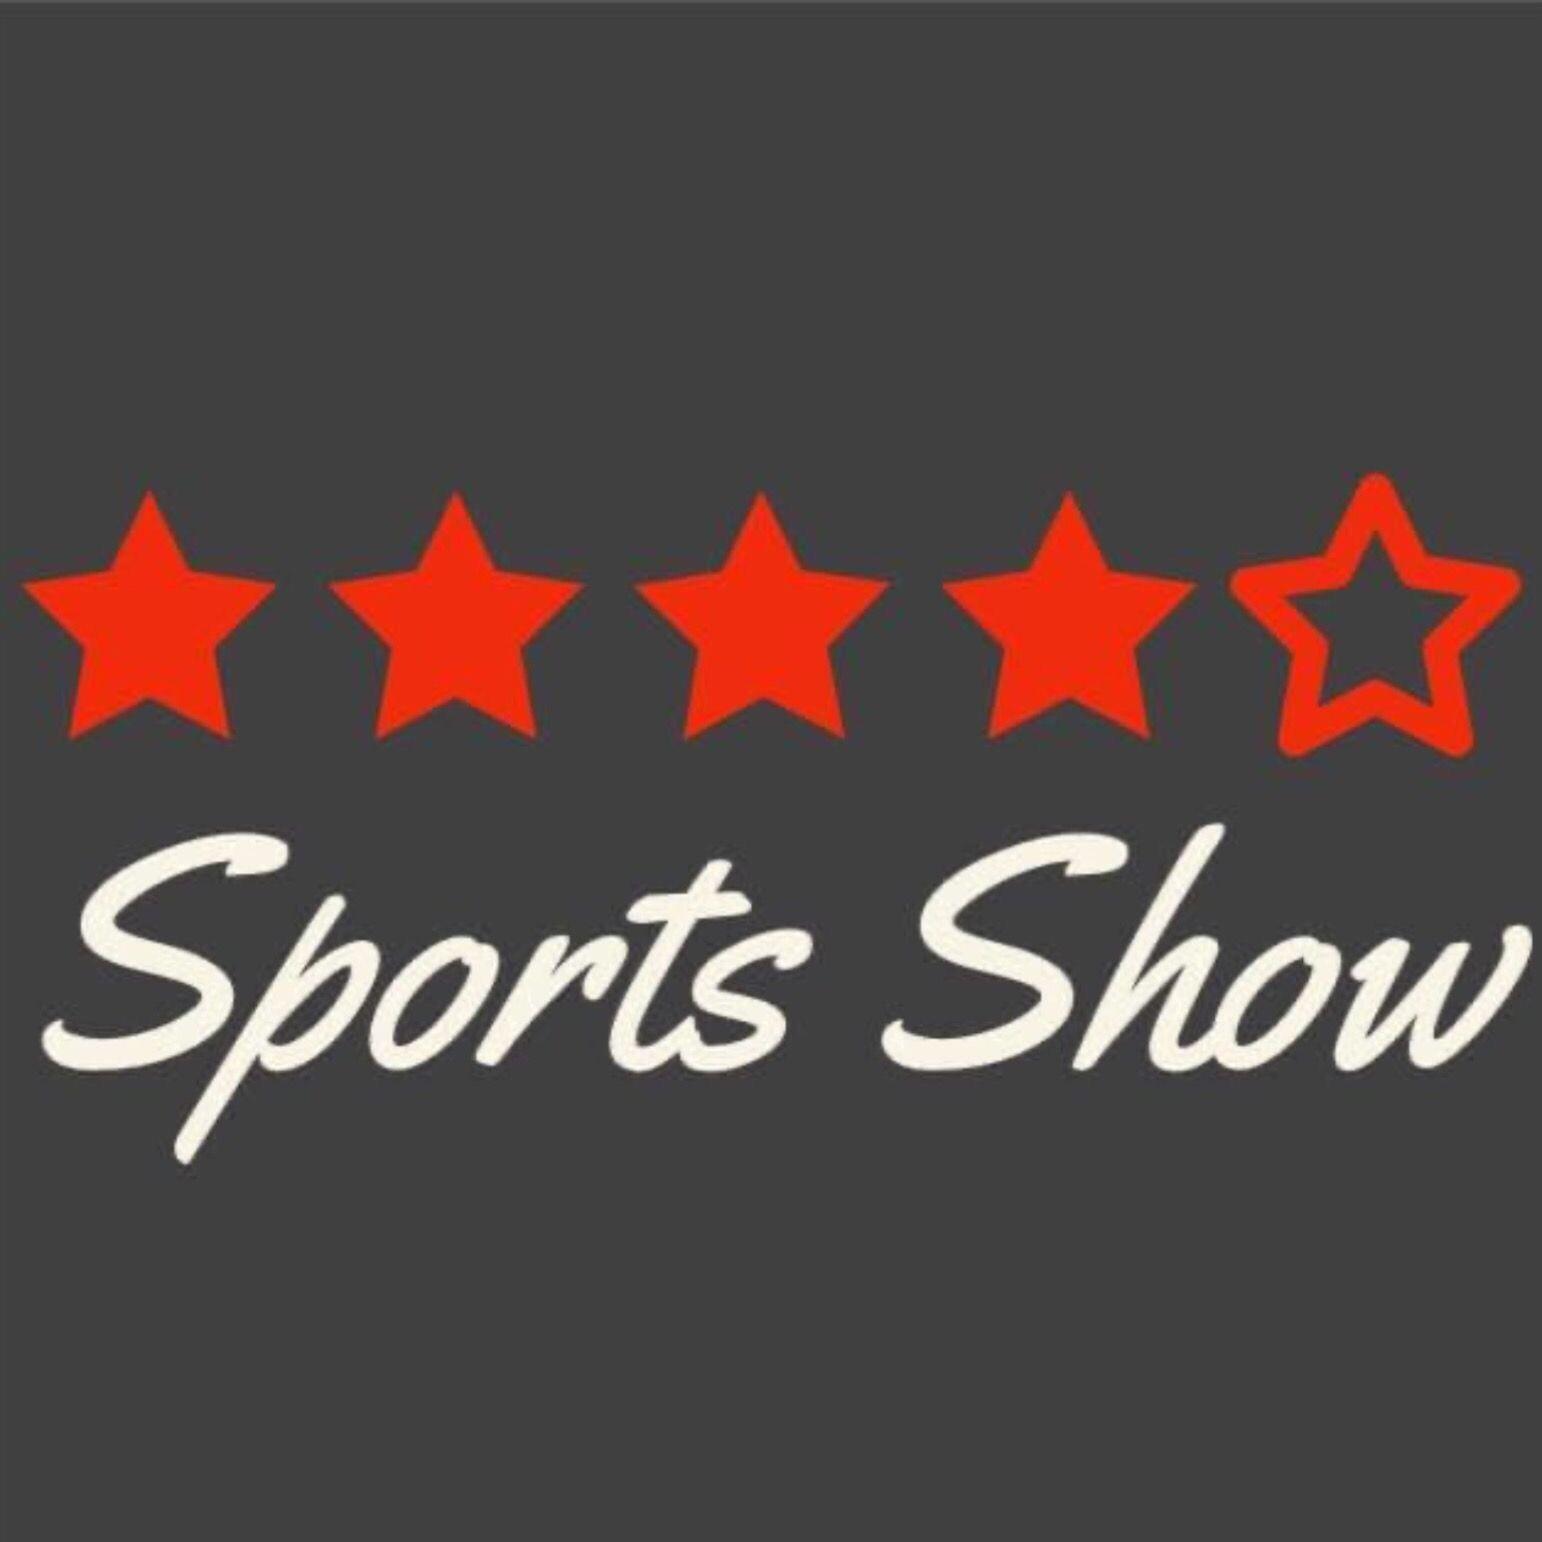 4 Star Sports Show